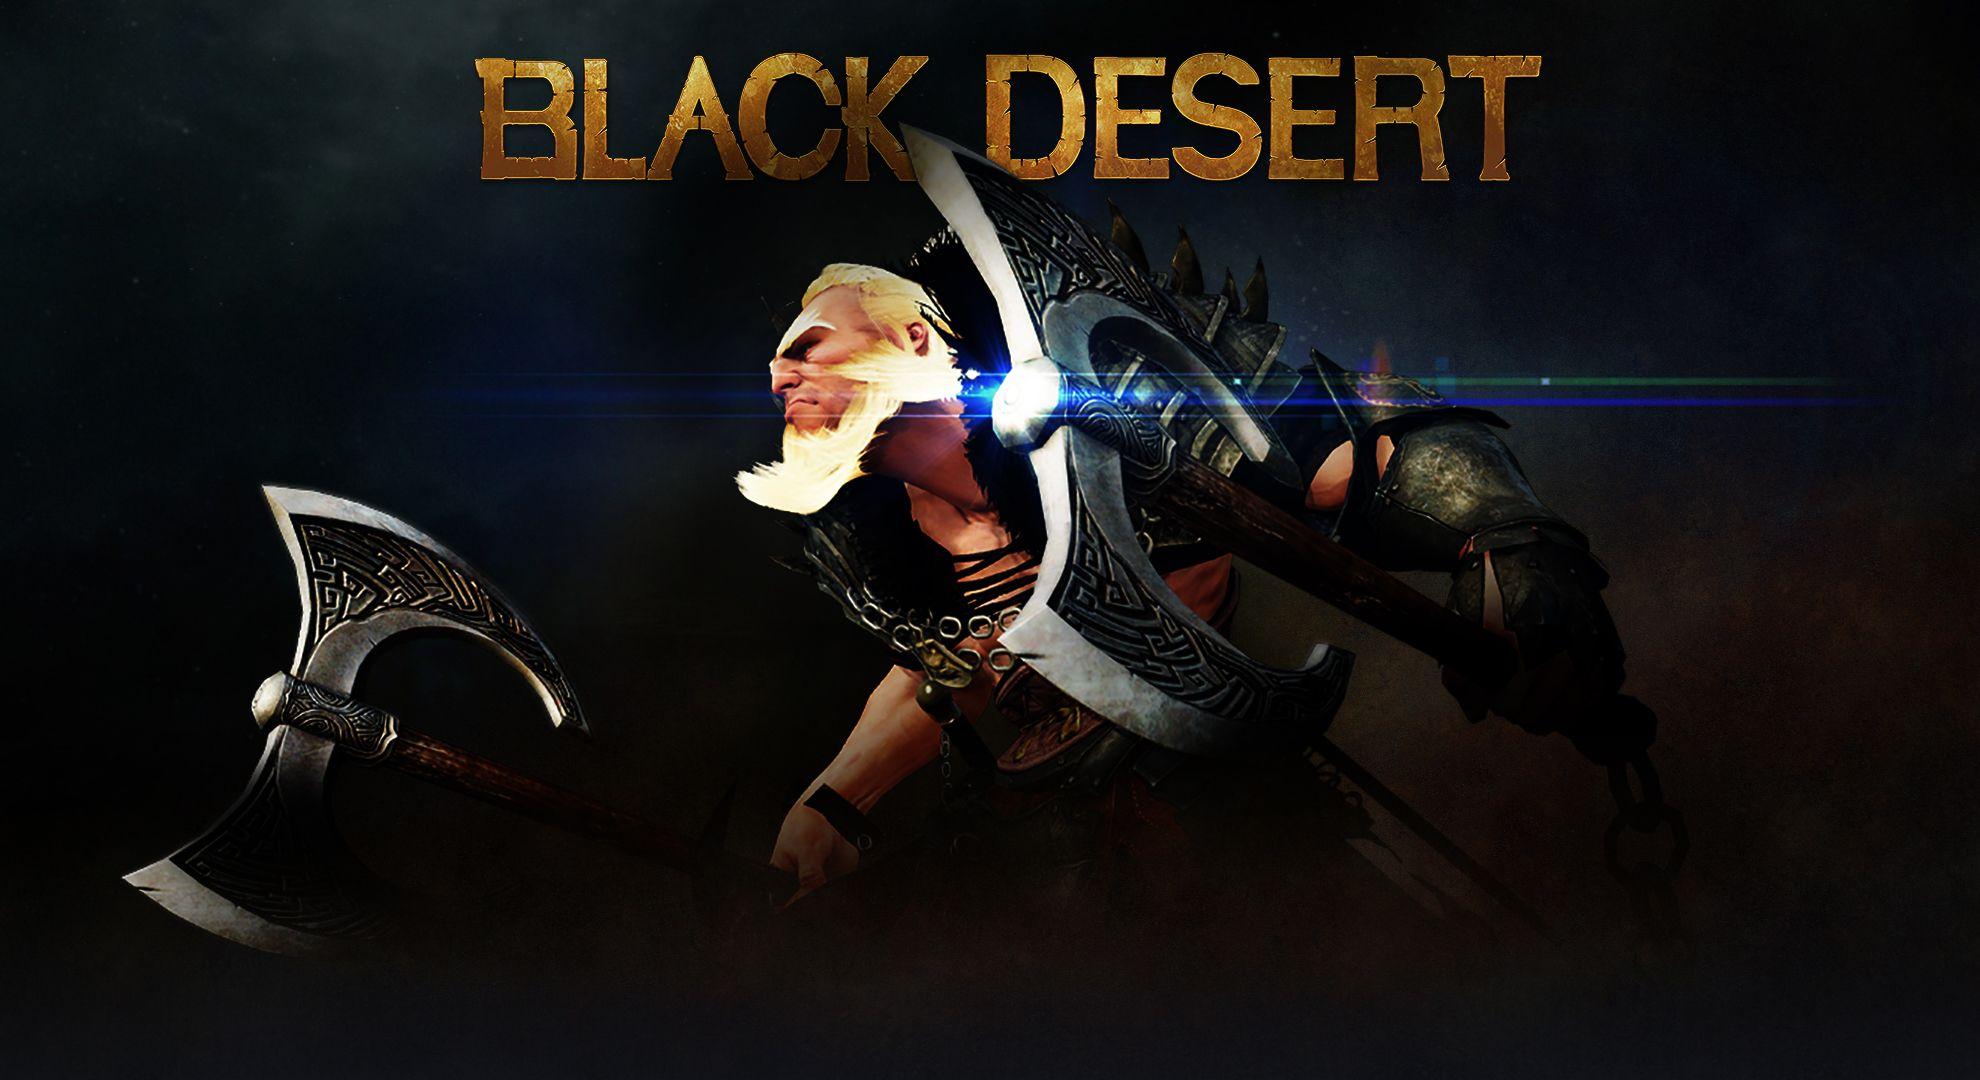 Games Desktop Wallpapers A Black Desert Pic 1870 1044 Black Desert Wallpapers 44 Wallpapers Adorable Wallpapers Deserts Bad Wolf Black